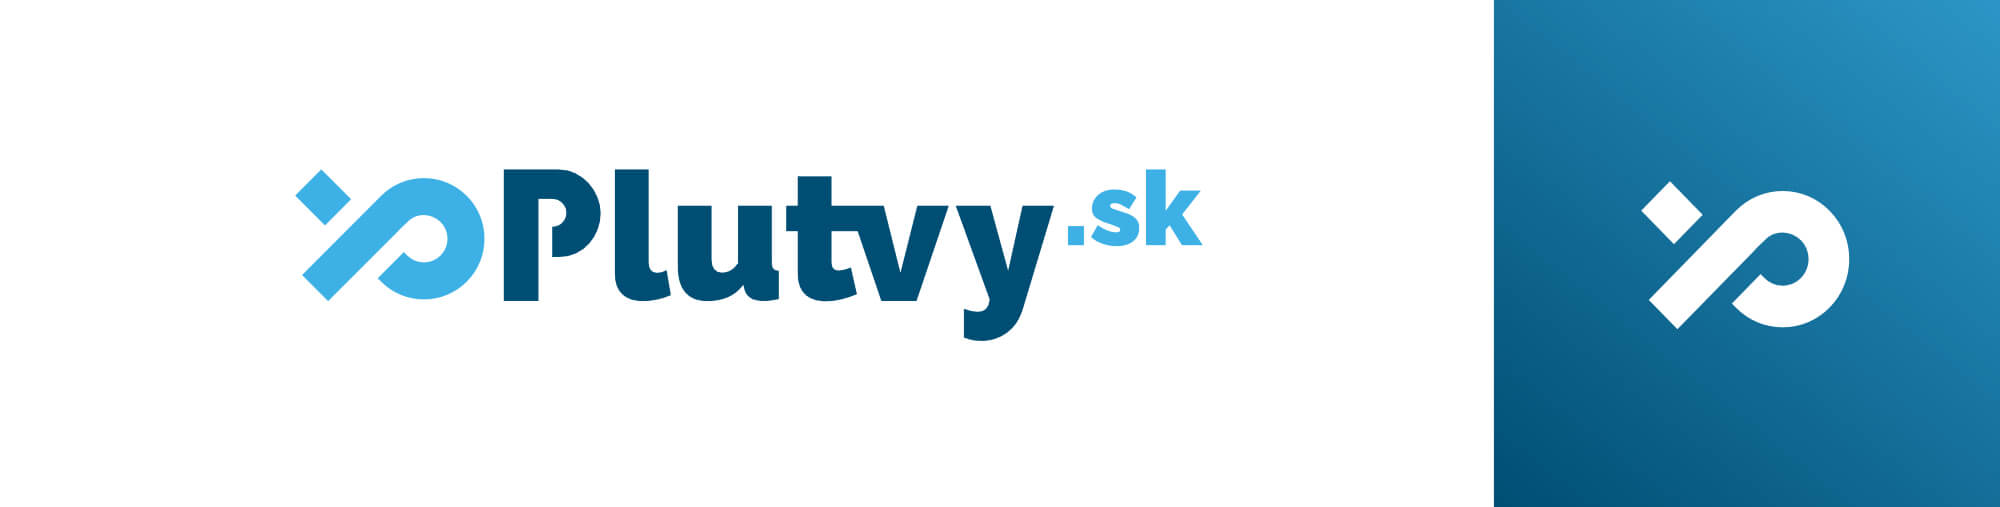 plutvy-sk final logo branding by michael maleek djibril